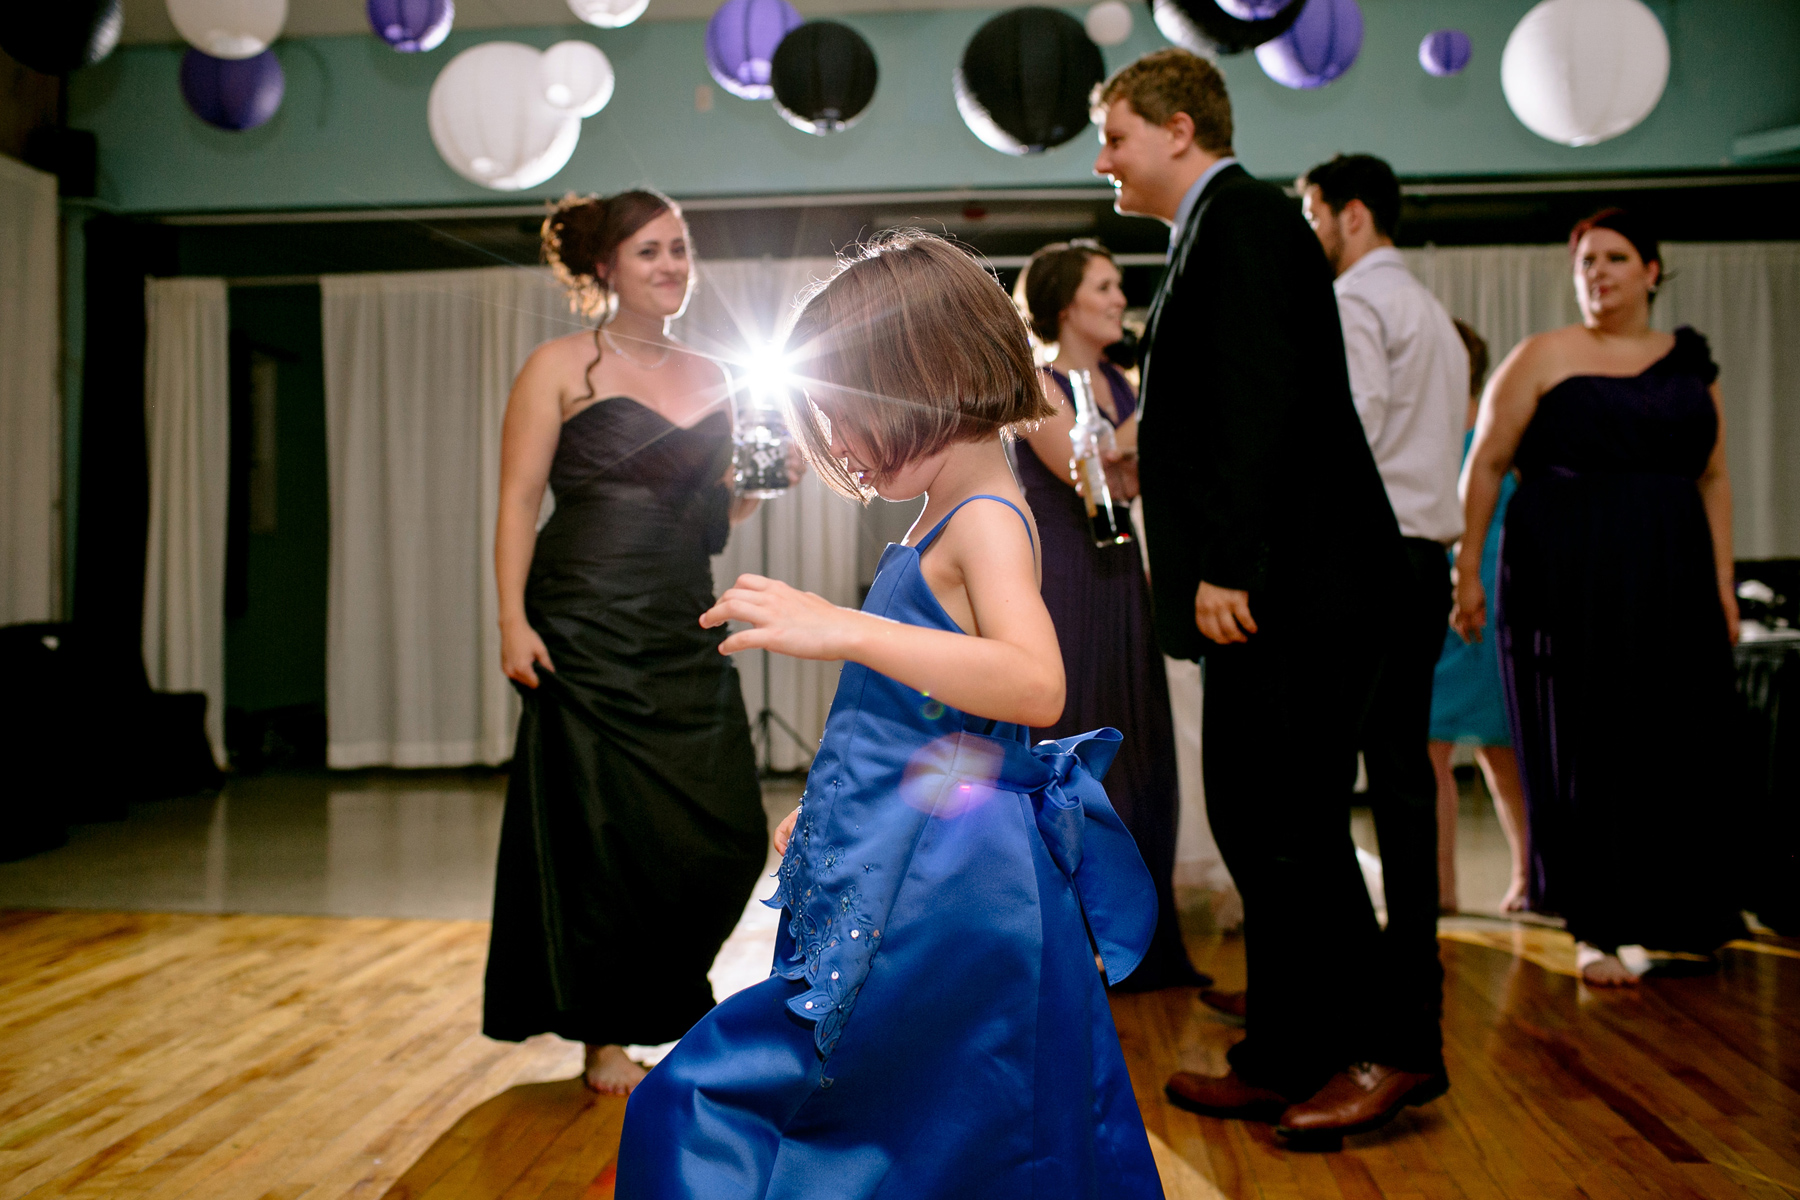 087-awesome-joggins-fossil-wedding-nova-scotia-kandisebrown-jl2016